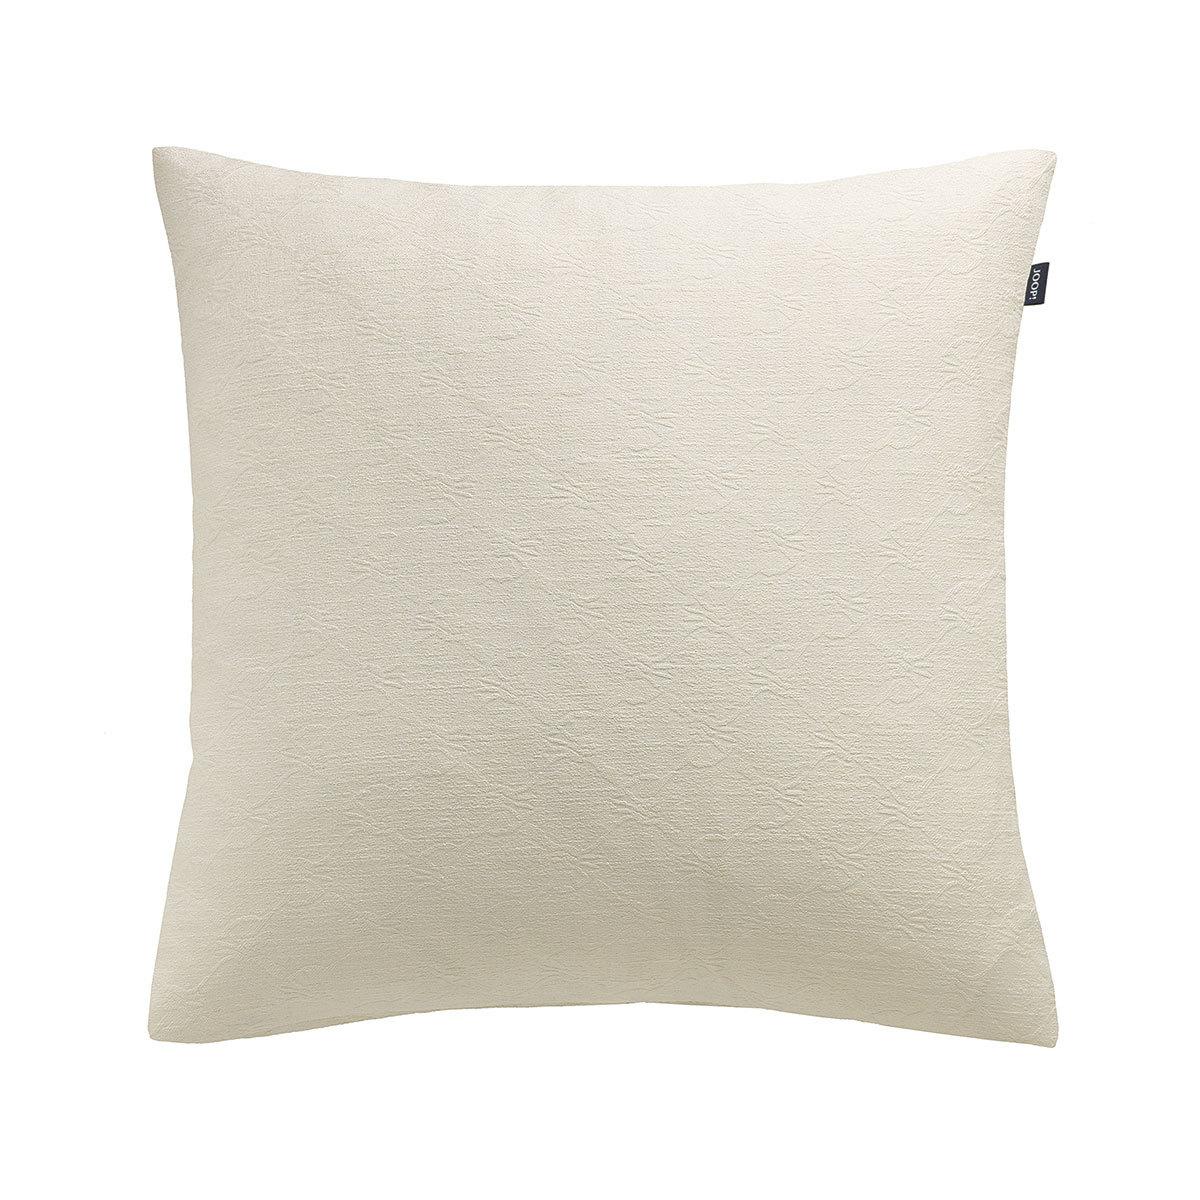 joop kissenh lle silk allover g nstig online kaufen bei bettwaren shop. Black Bedroom Furniture Sets. Home Design Ideas